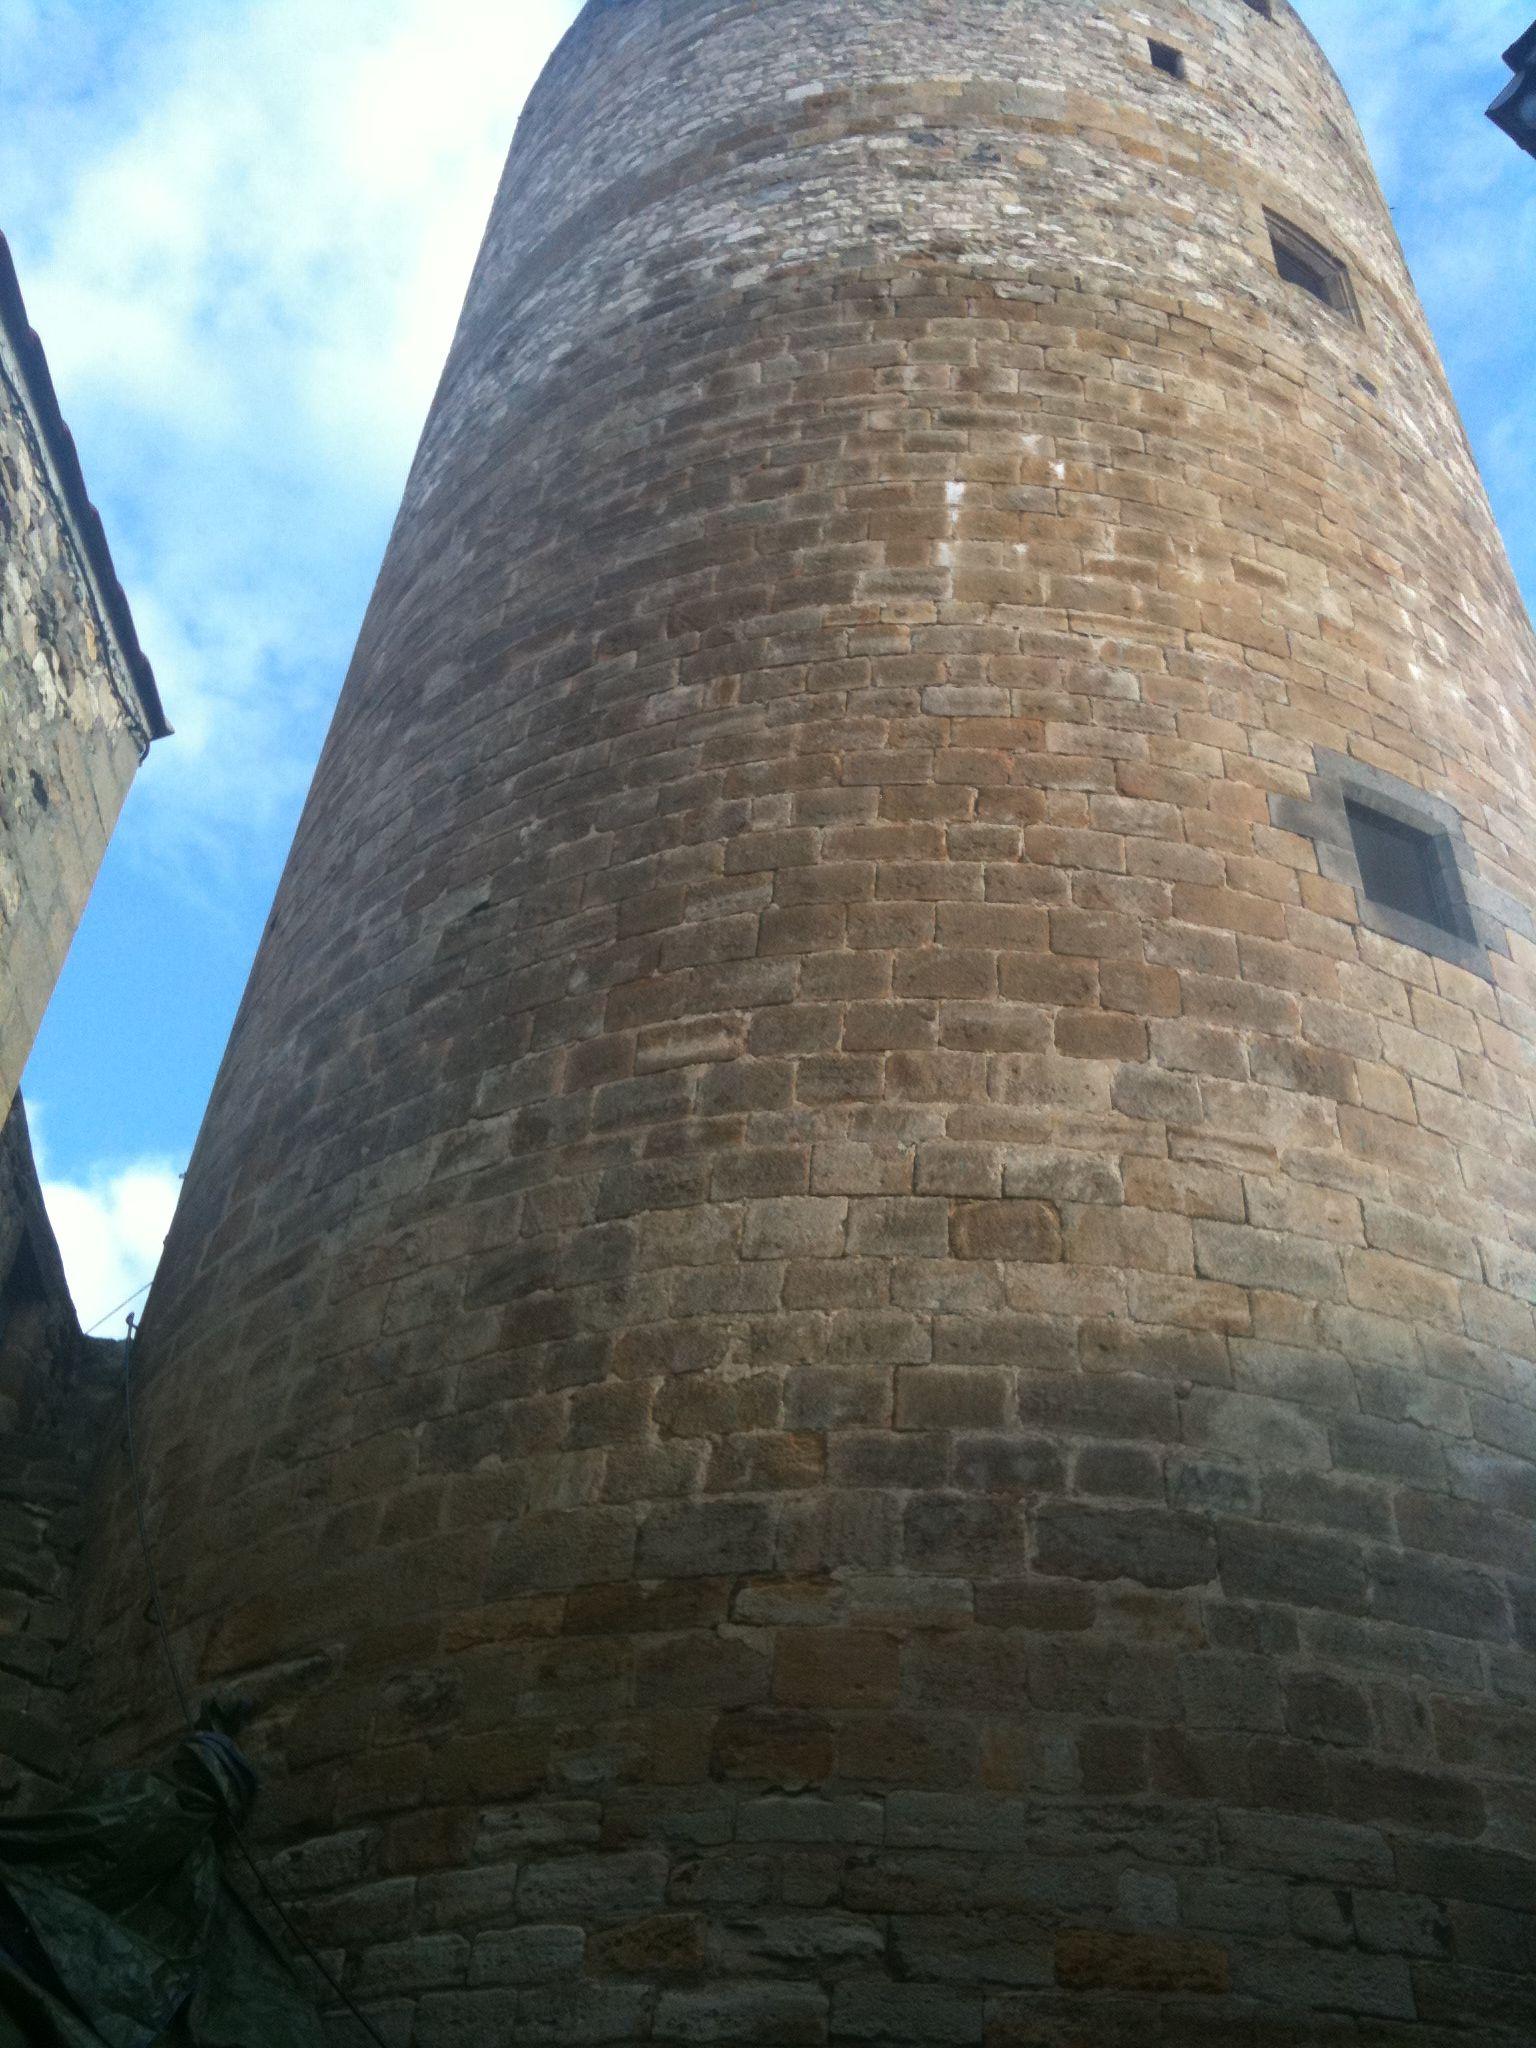 Tower in La Sauvetat.